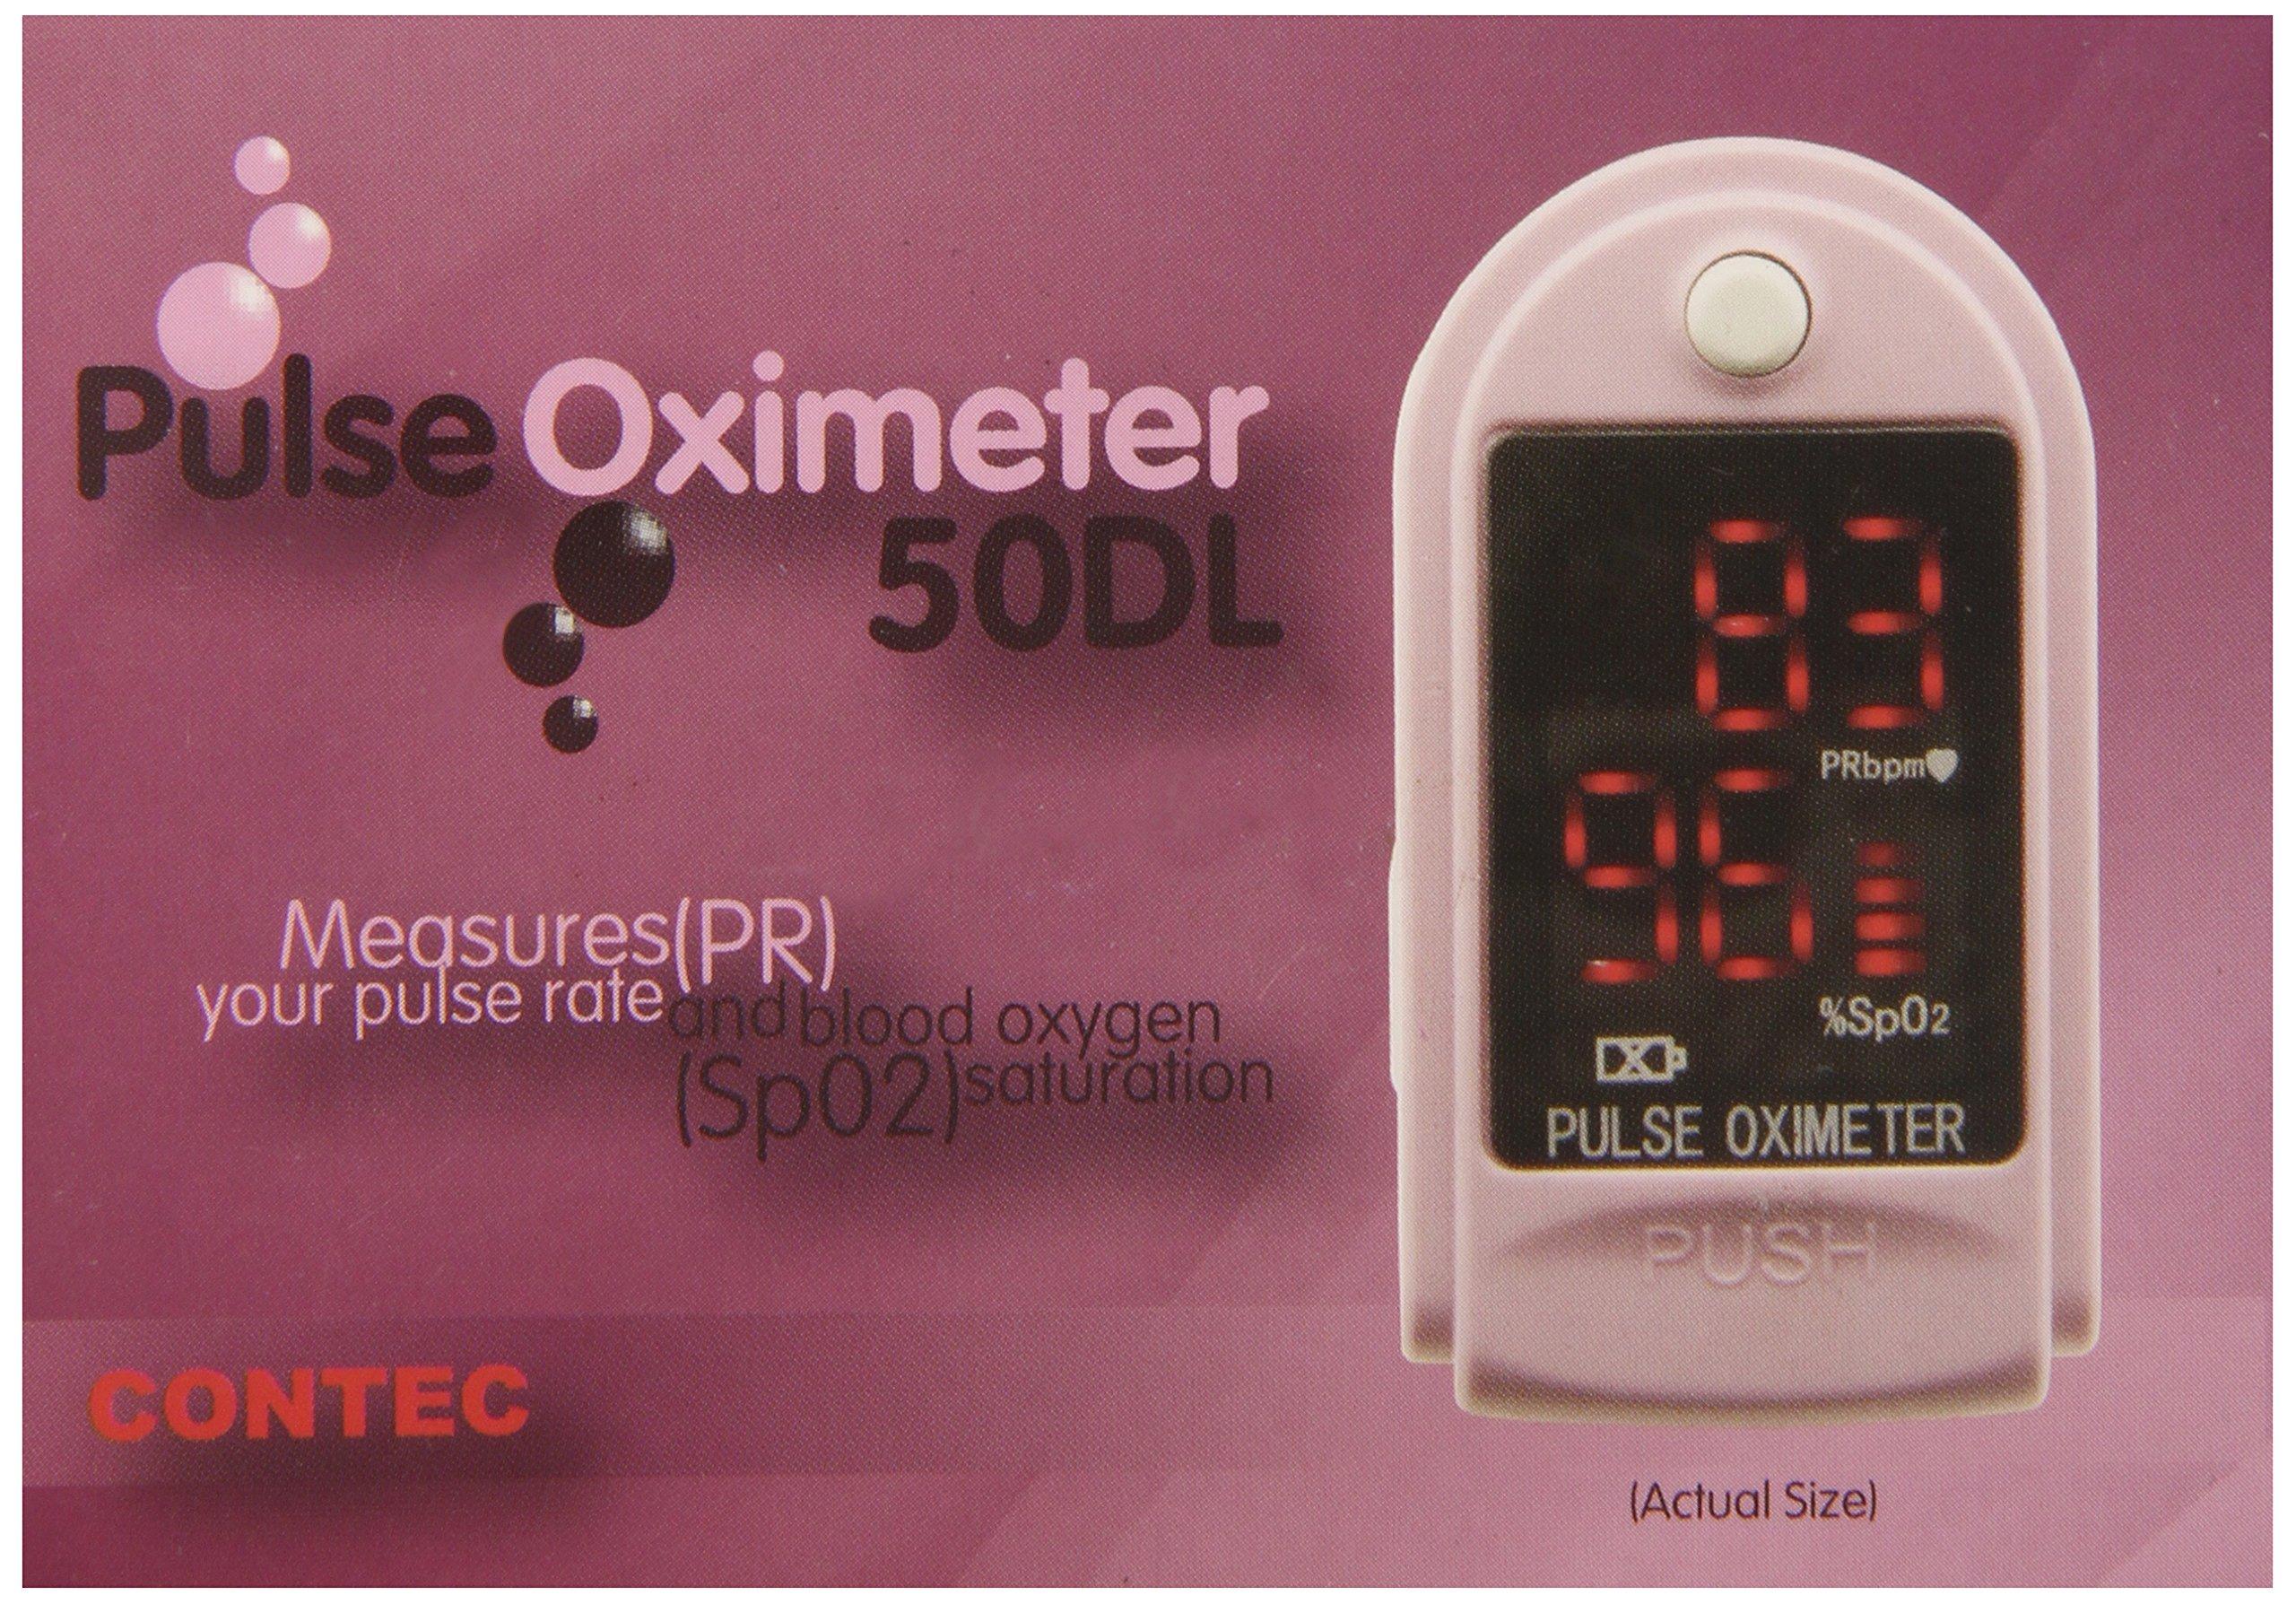 Contec Medical Systems 50DL Finger Pulse Oximeter, Pink